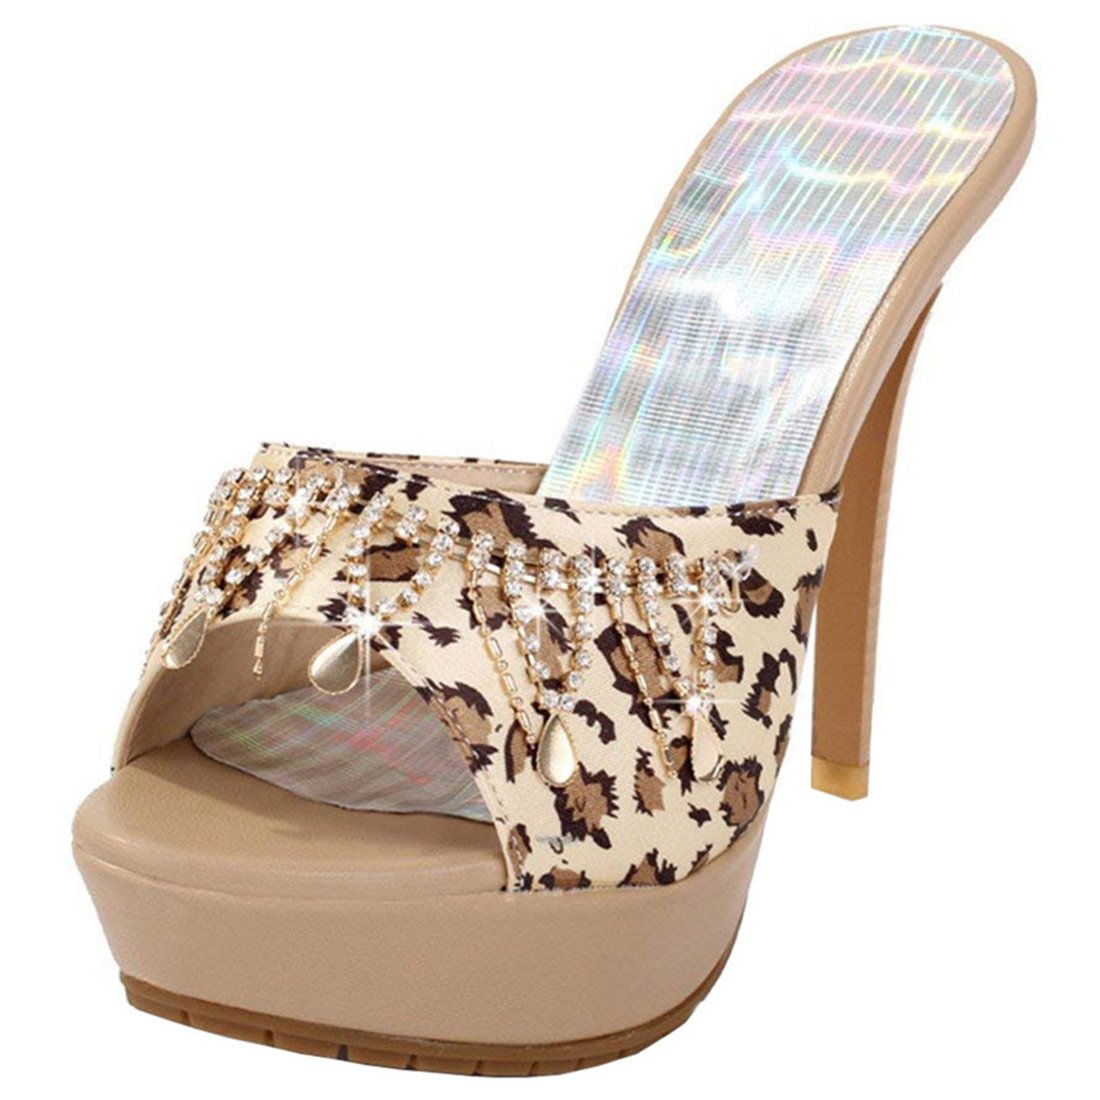 b8bc6469316 Amazon.com   Artfaerie Women's Stiletto Heel Leopard Print Mules ...